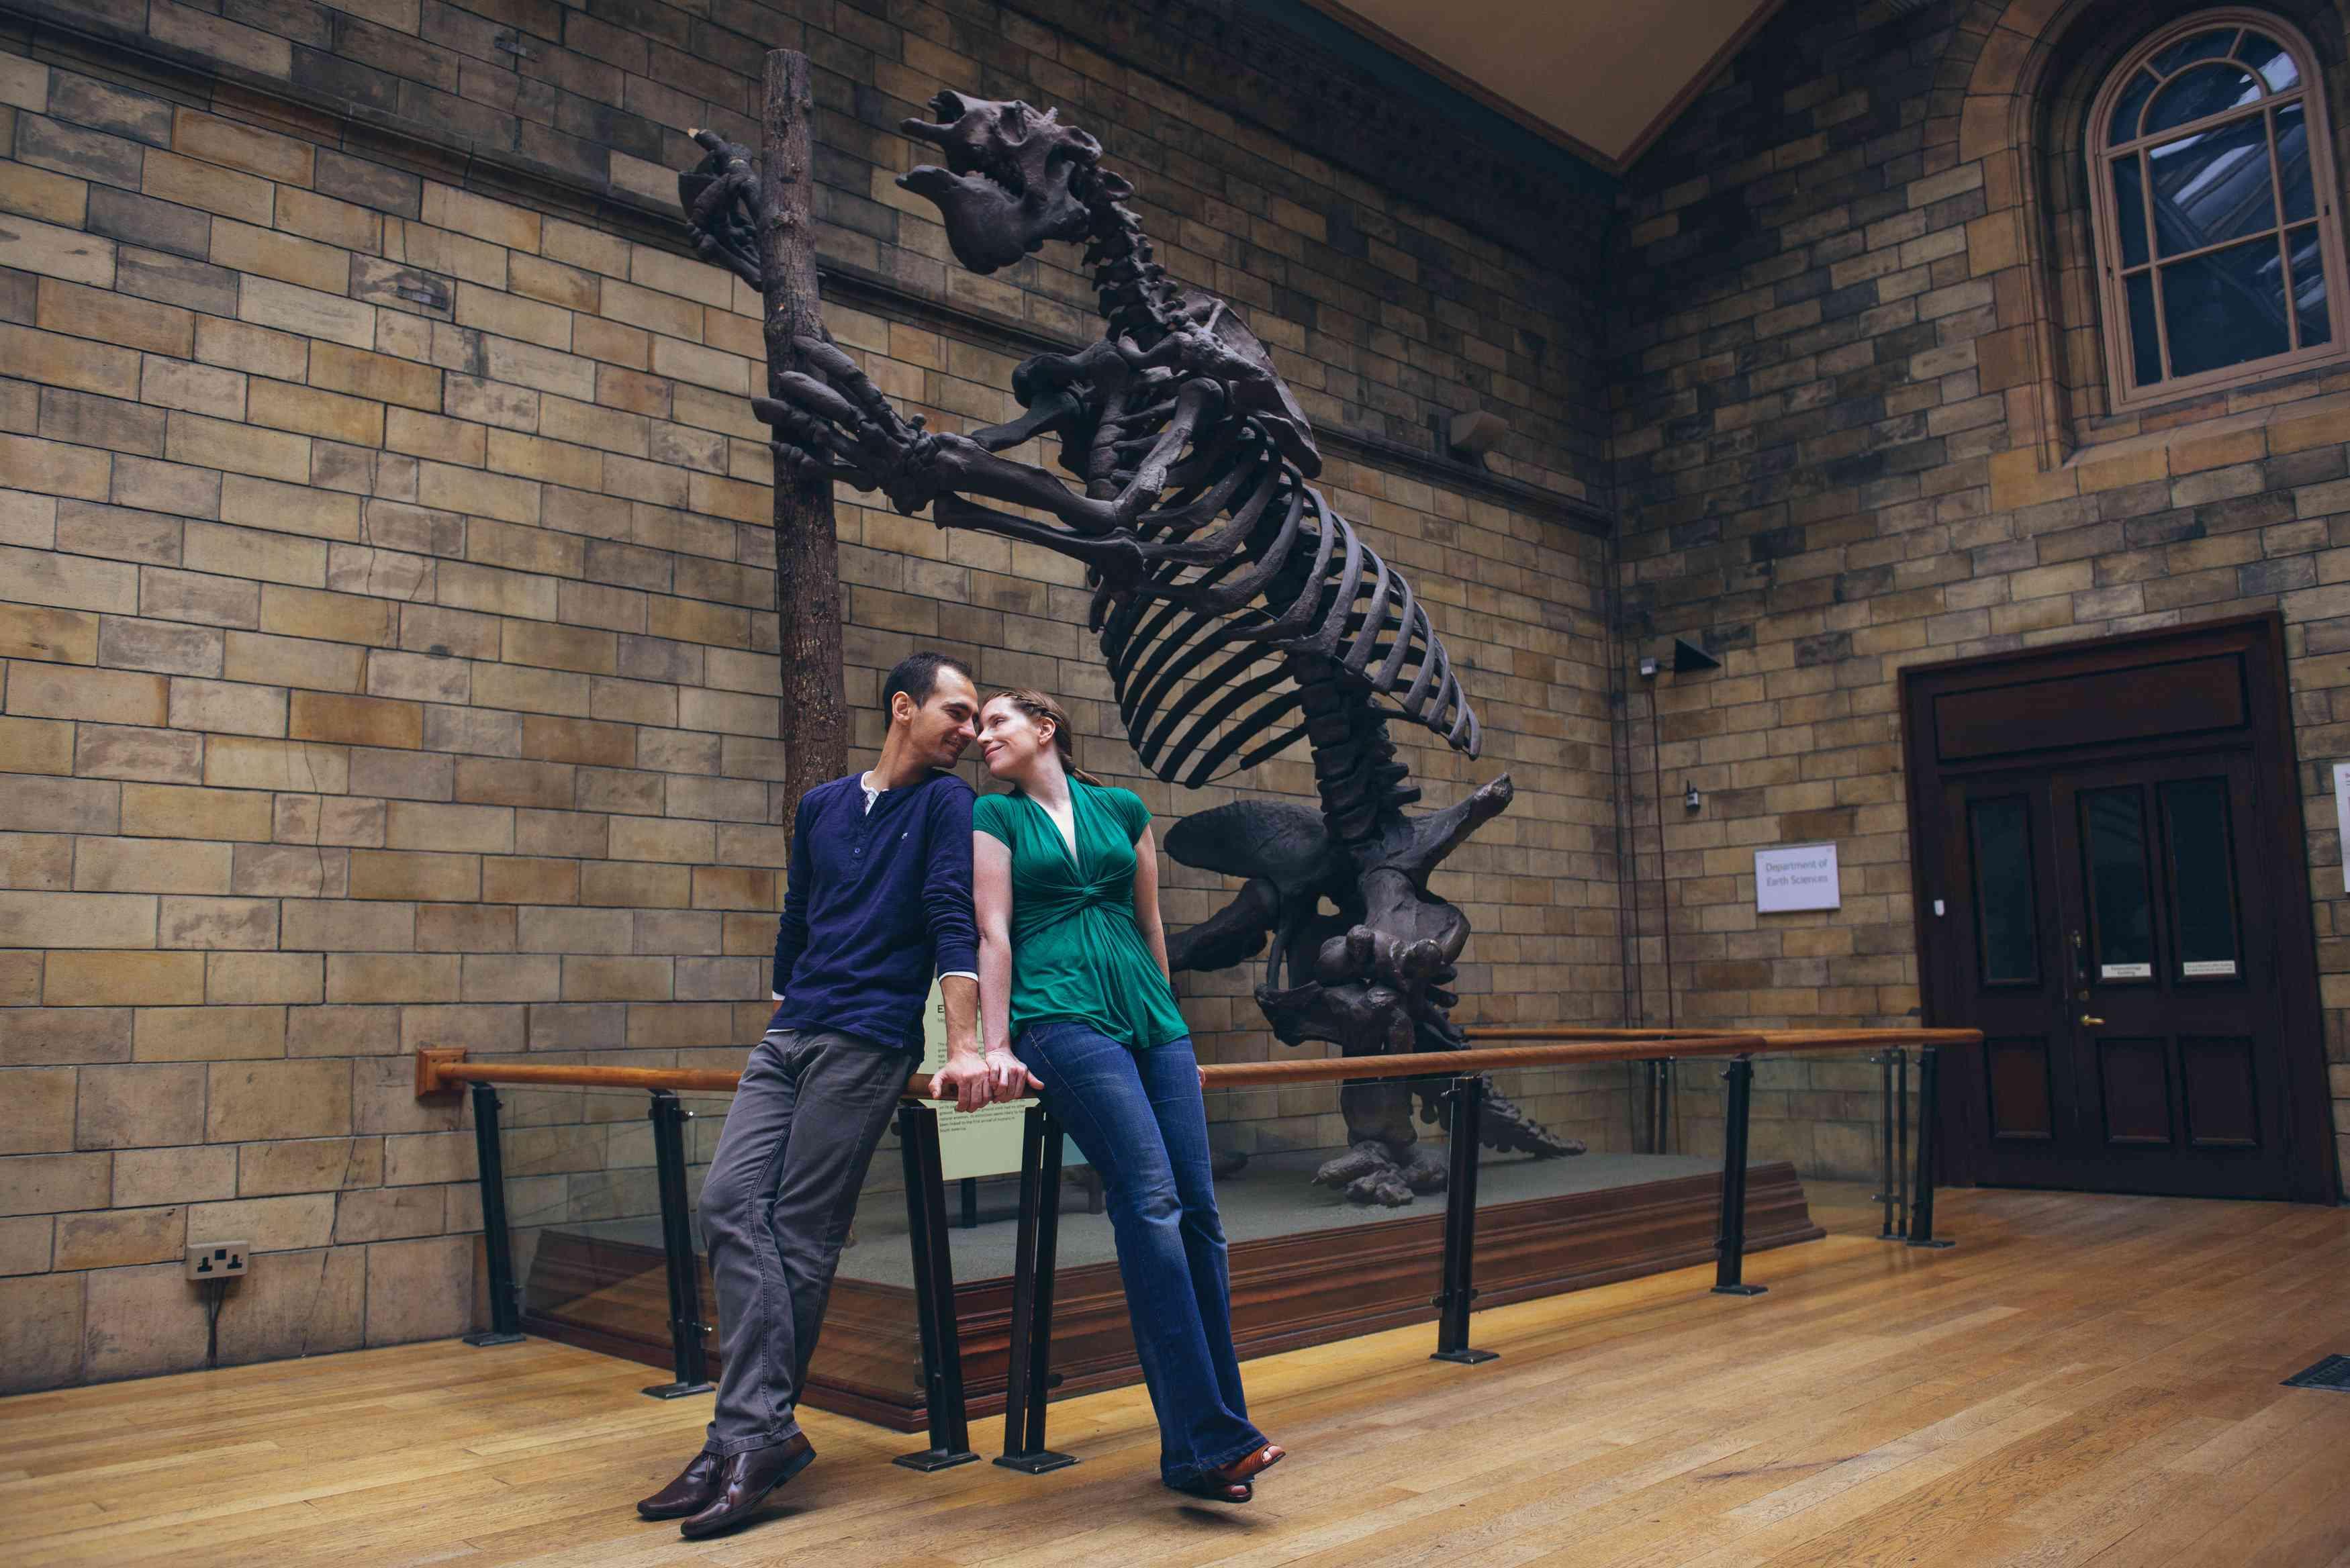 17 Genius Indoor Locations to Shoot Your Engagement Photos